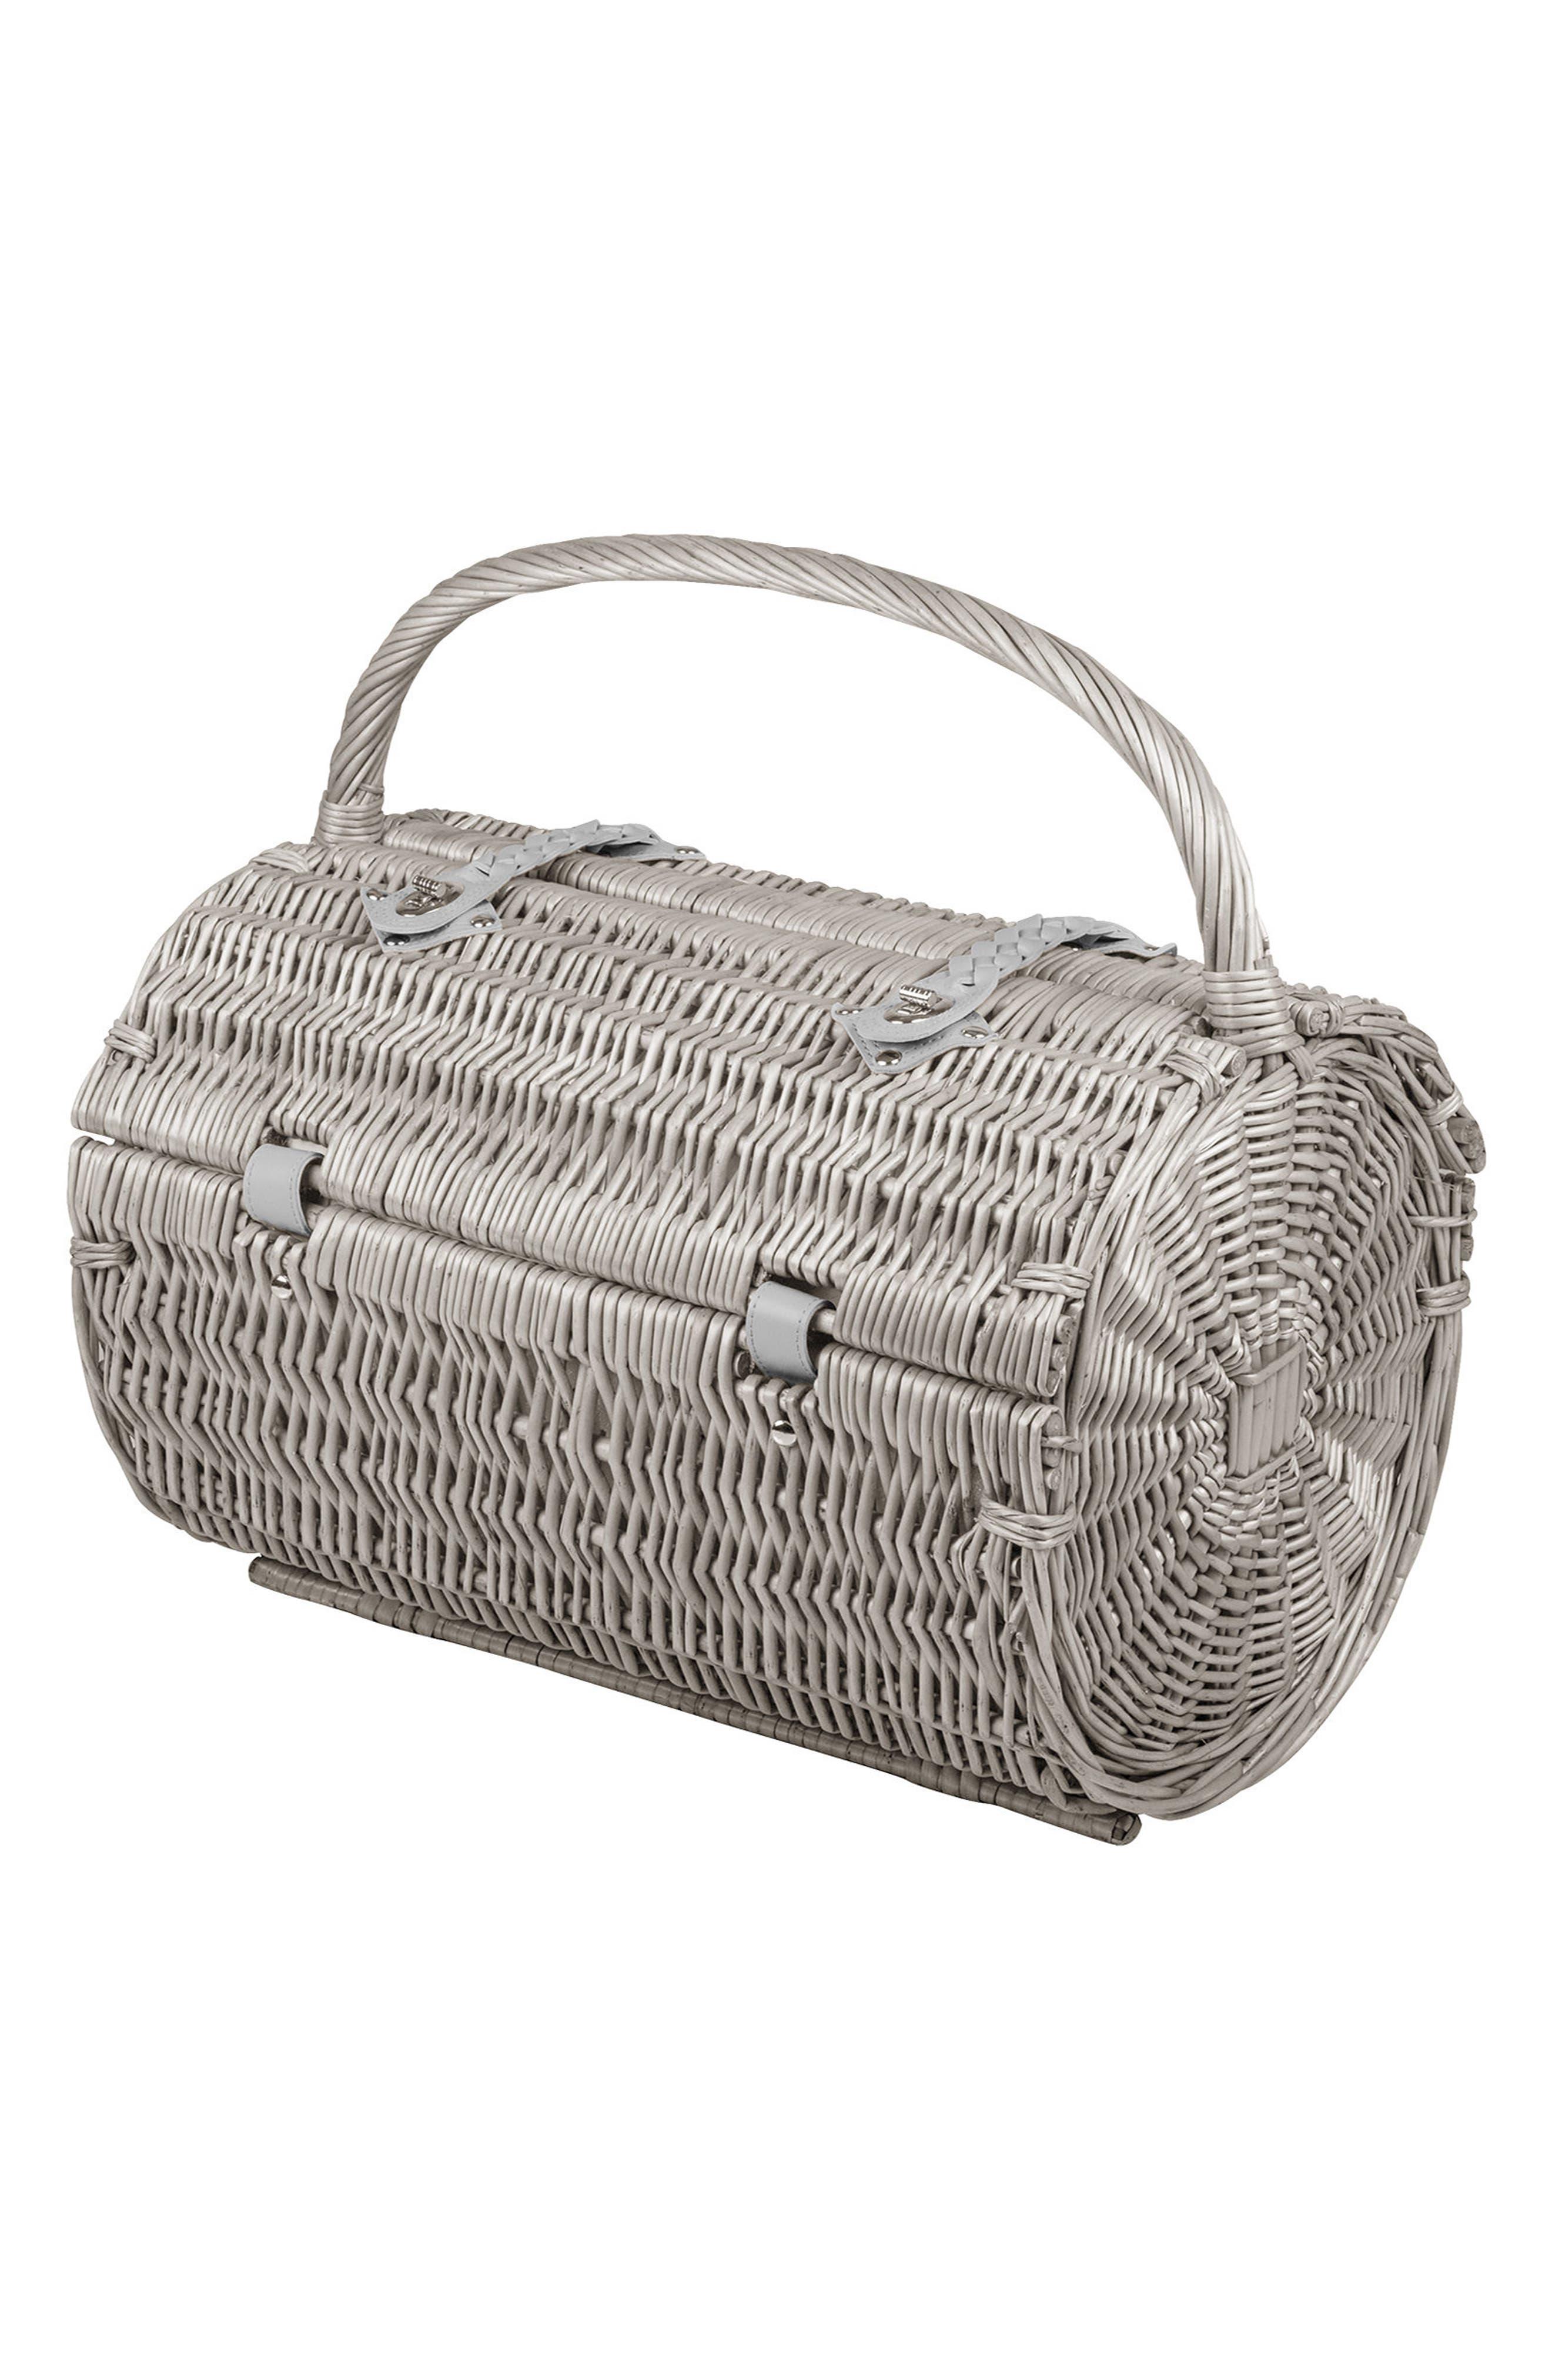 Wicker Barrel Picnic Basket,                             Main thumbnail 1, color,                             400